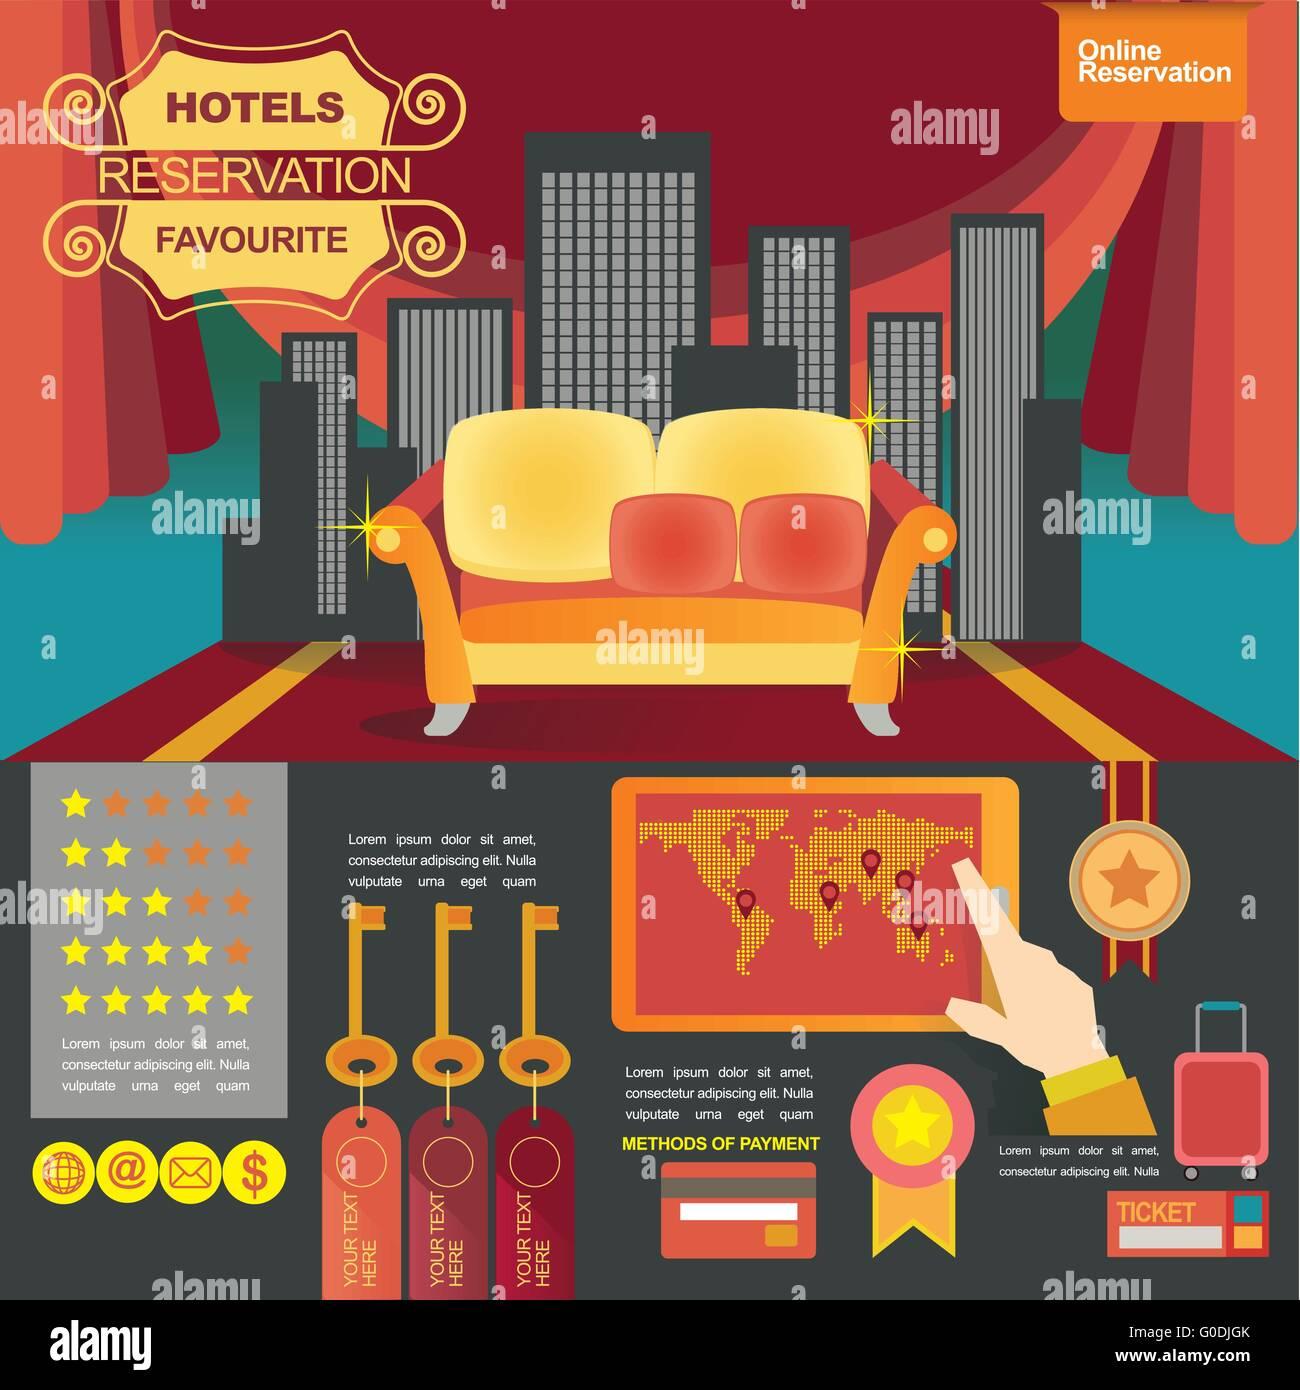 concept illustration banner template for hotels reservation and on line shop - Stock Image